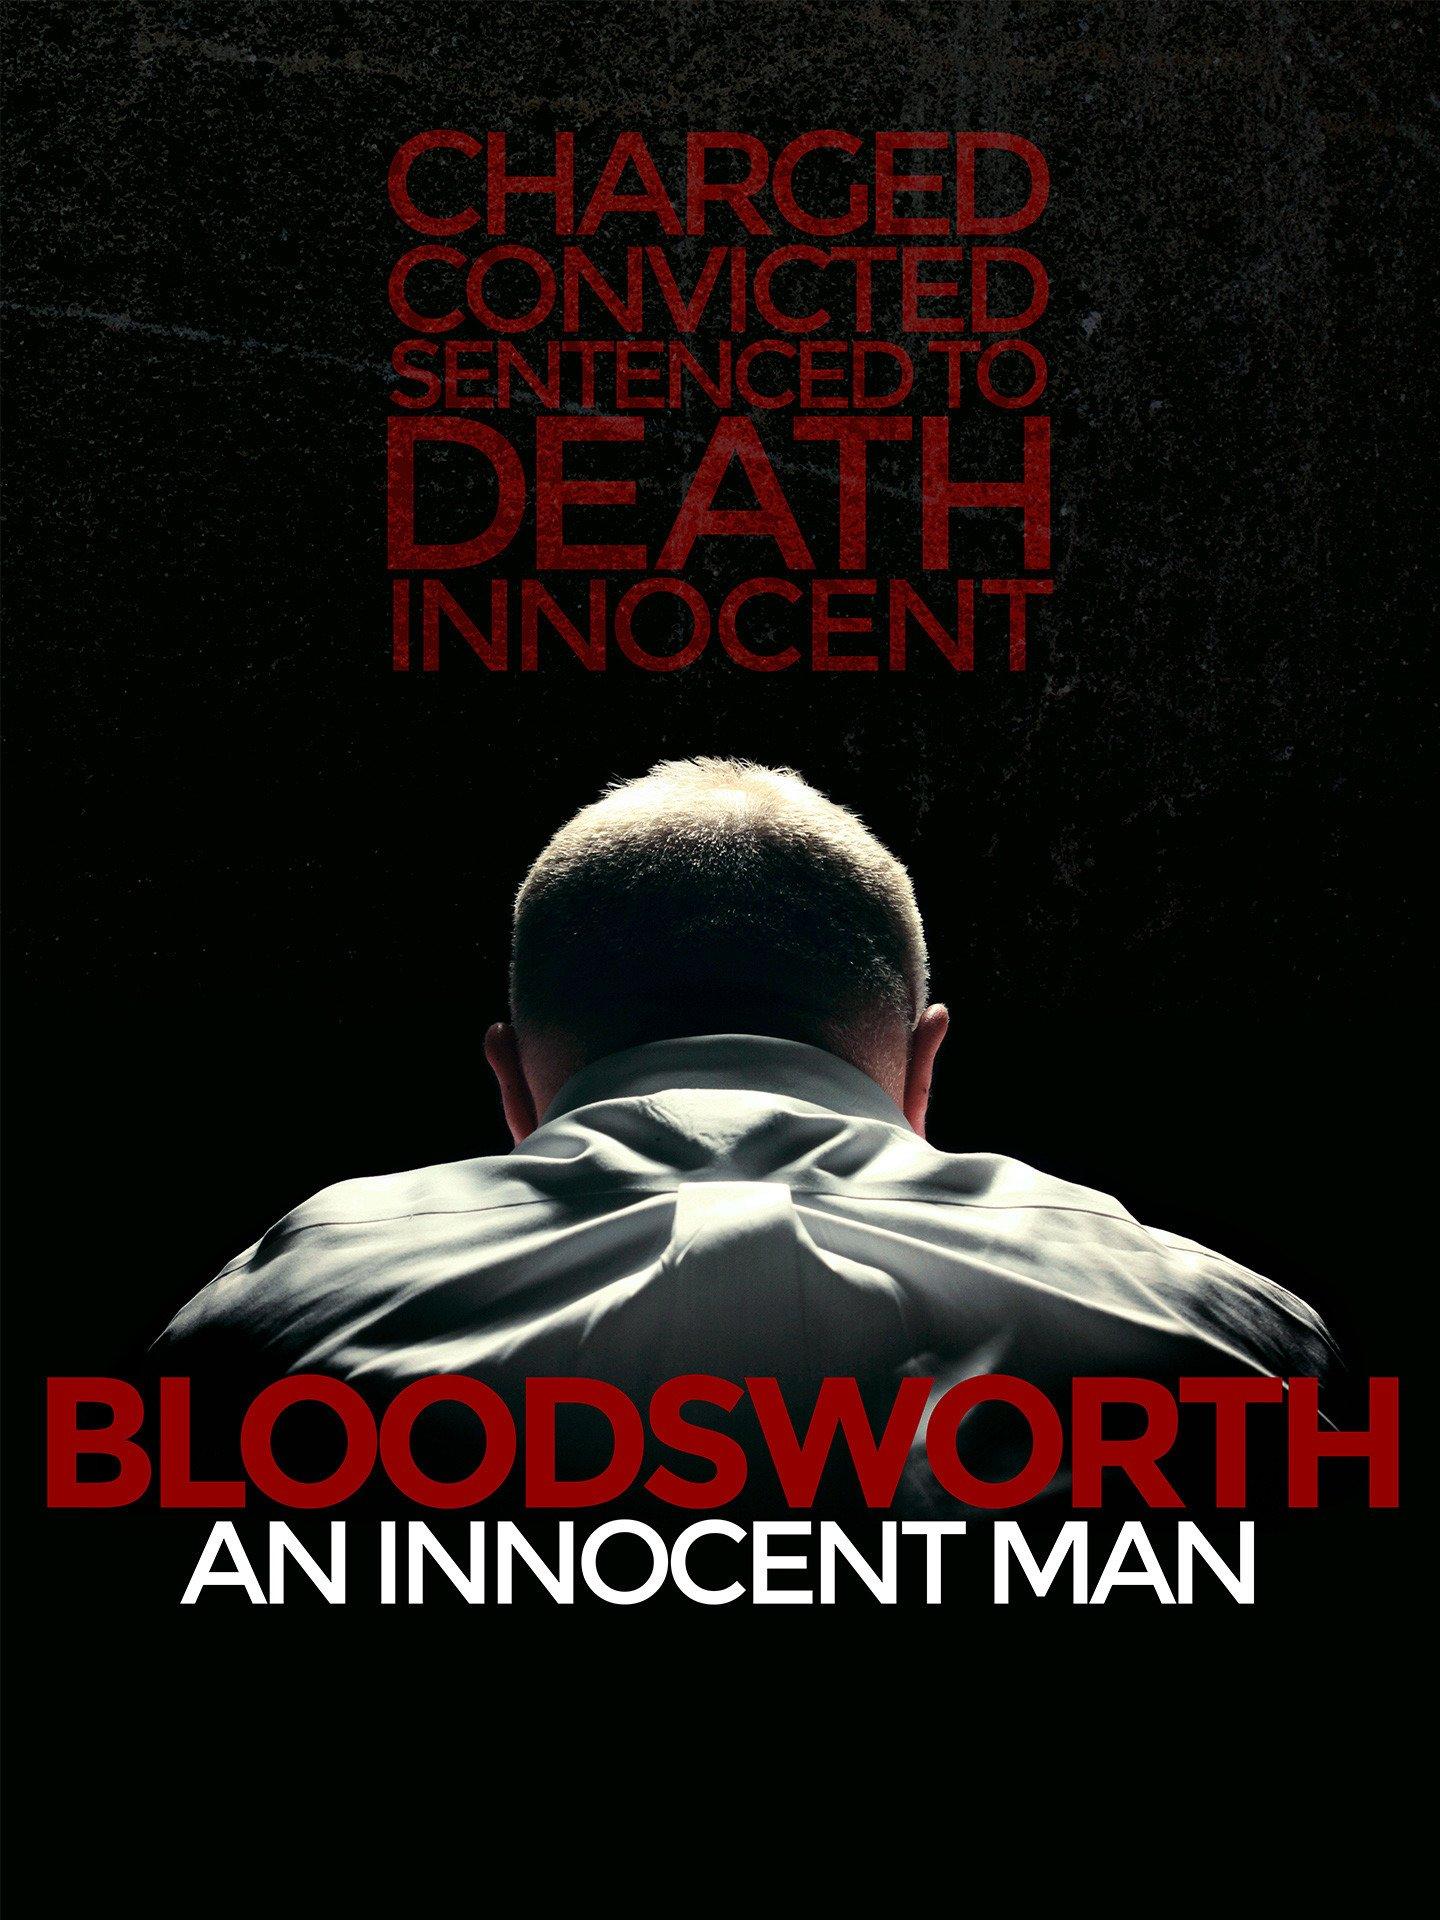 Bloodsworth - An Innocent Man on Amazon Prime Video UK